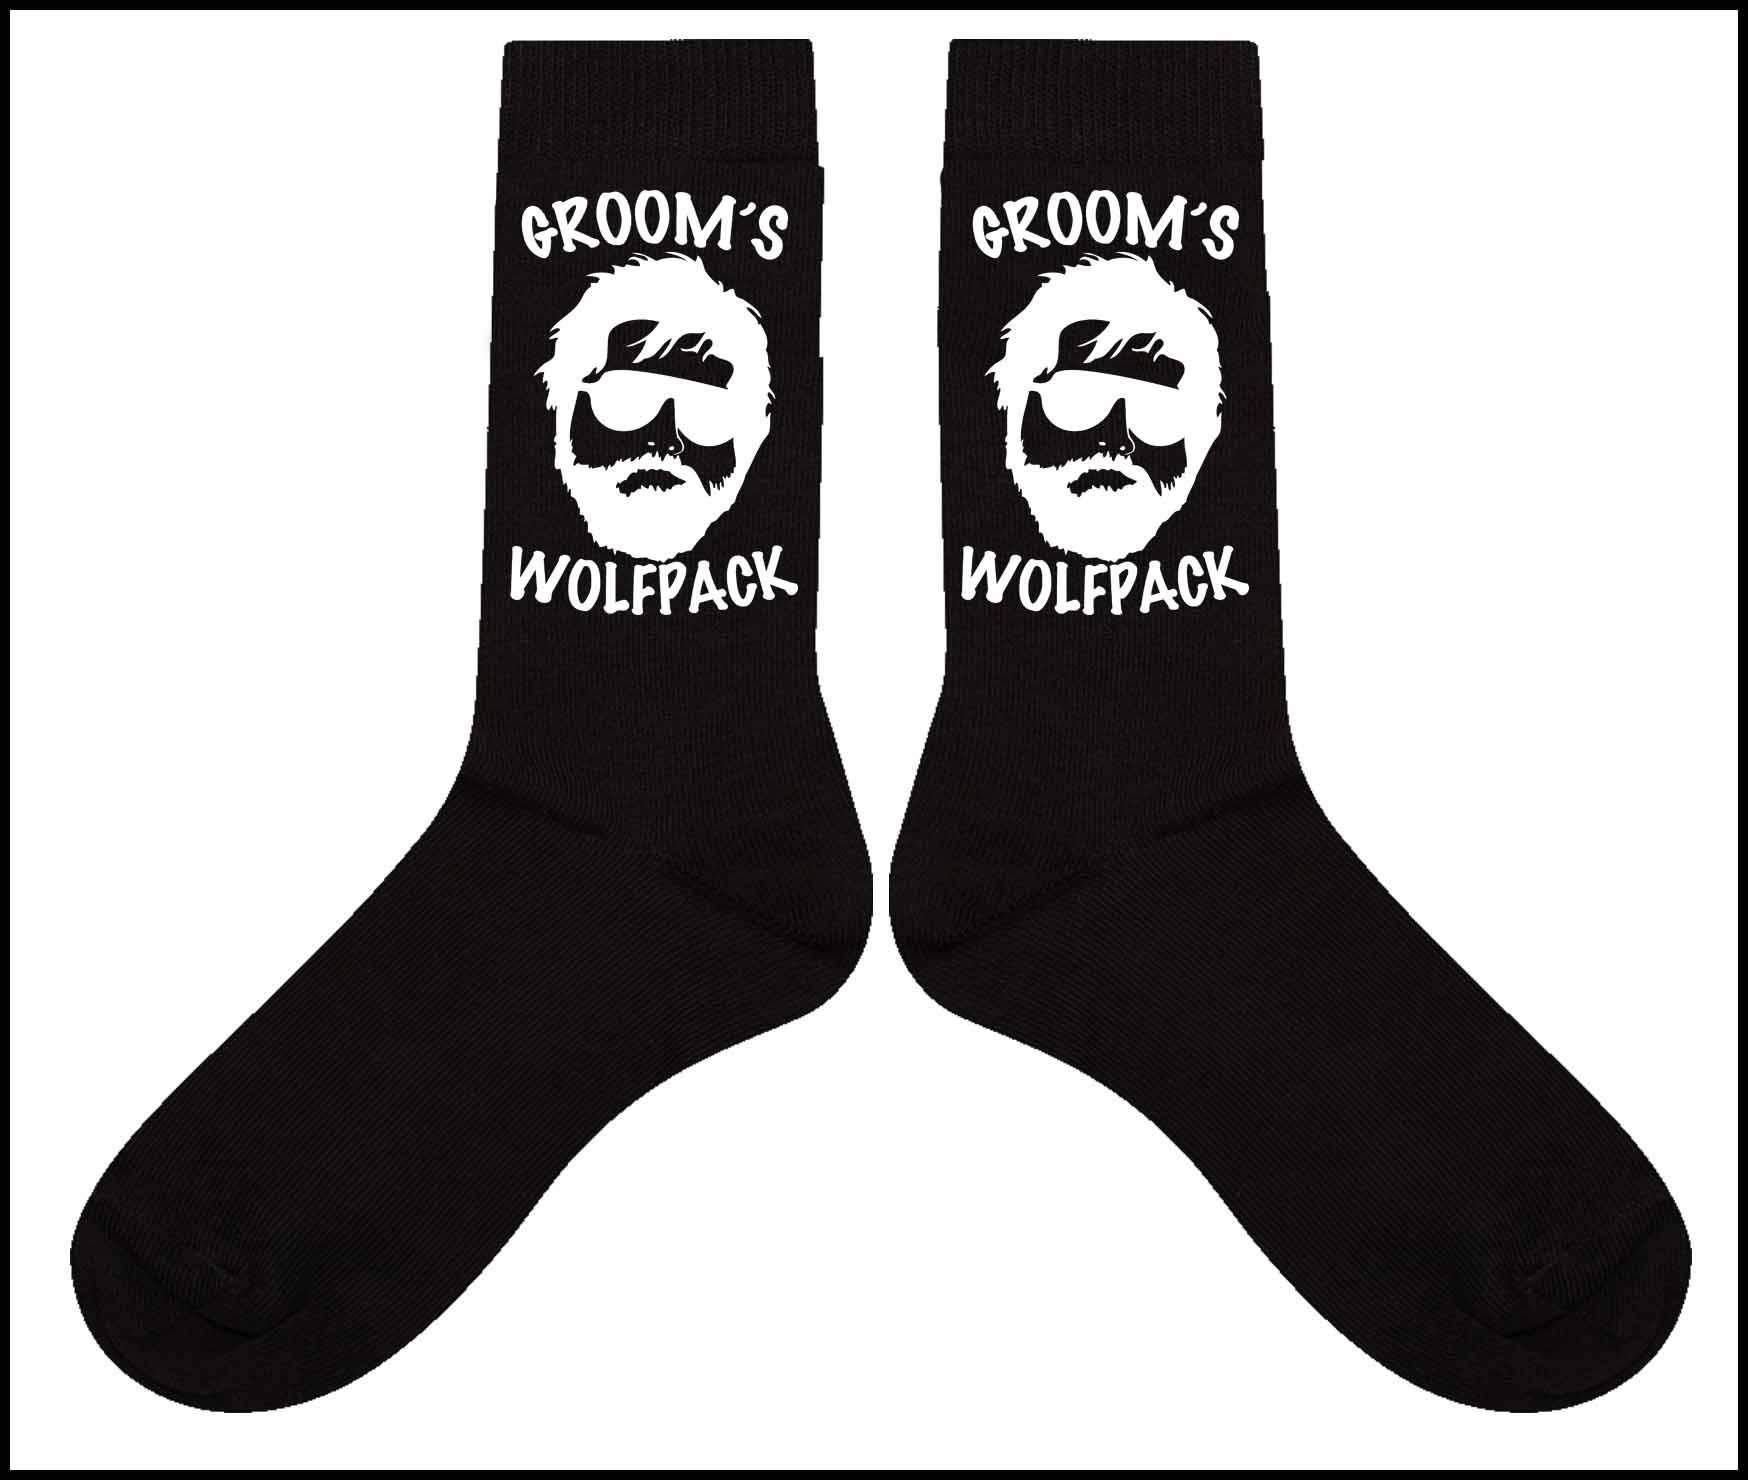 Groom's Wolfpack Cotton Socks